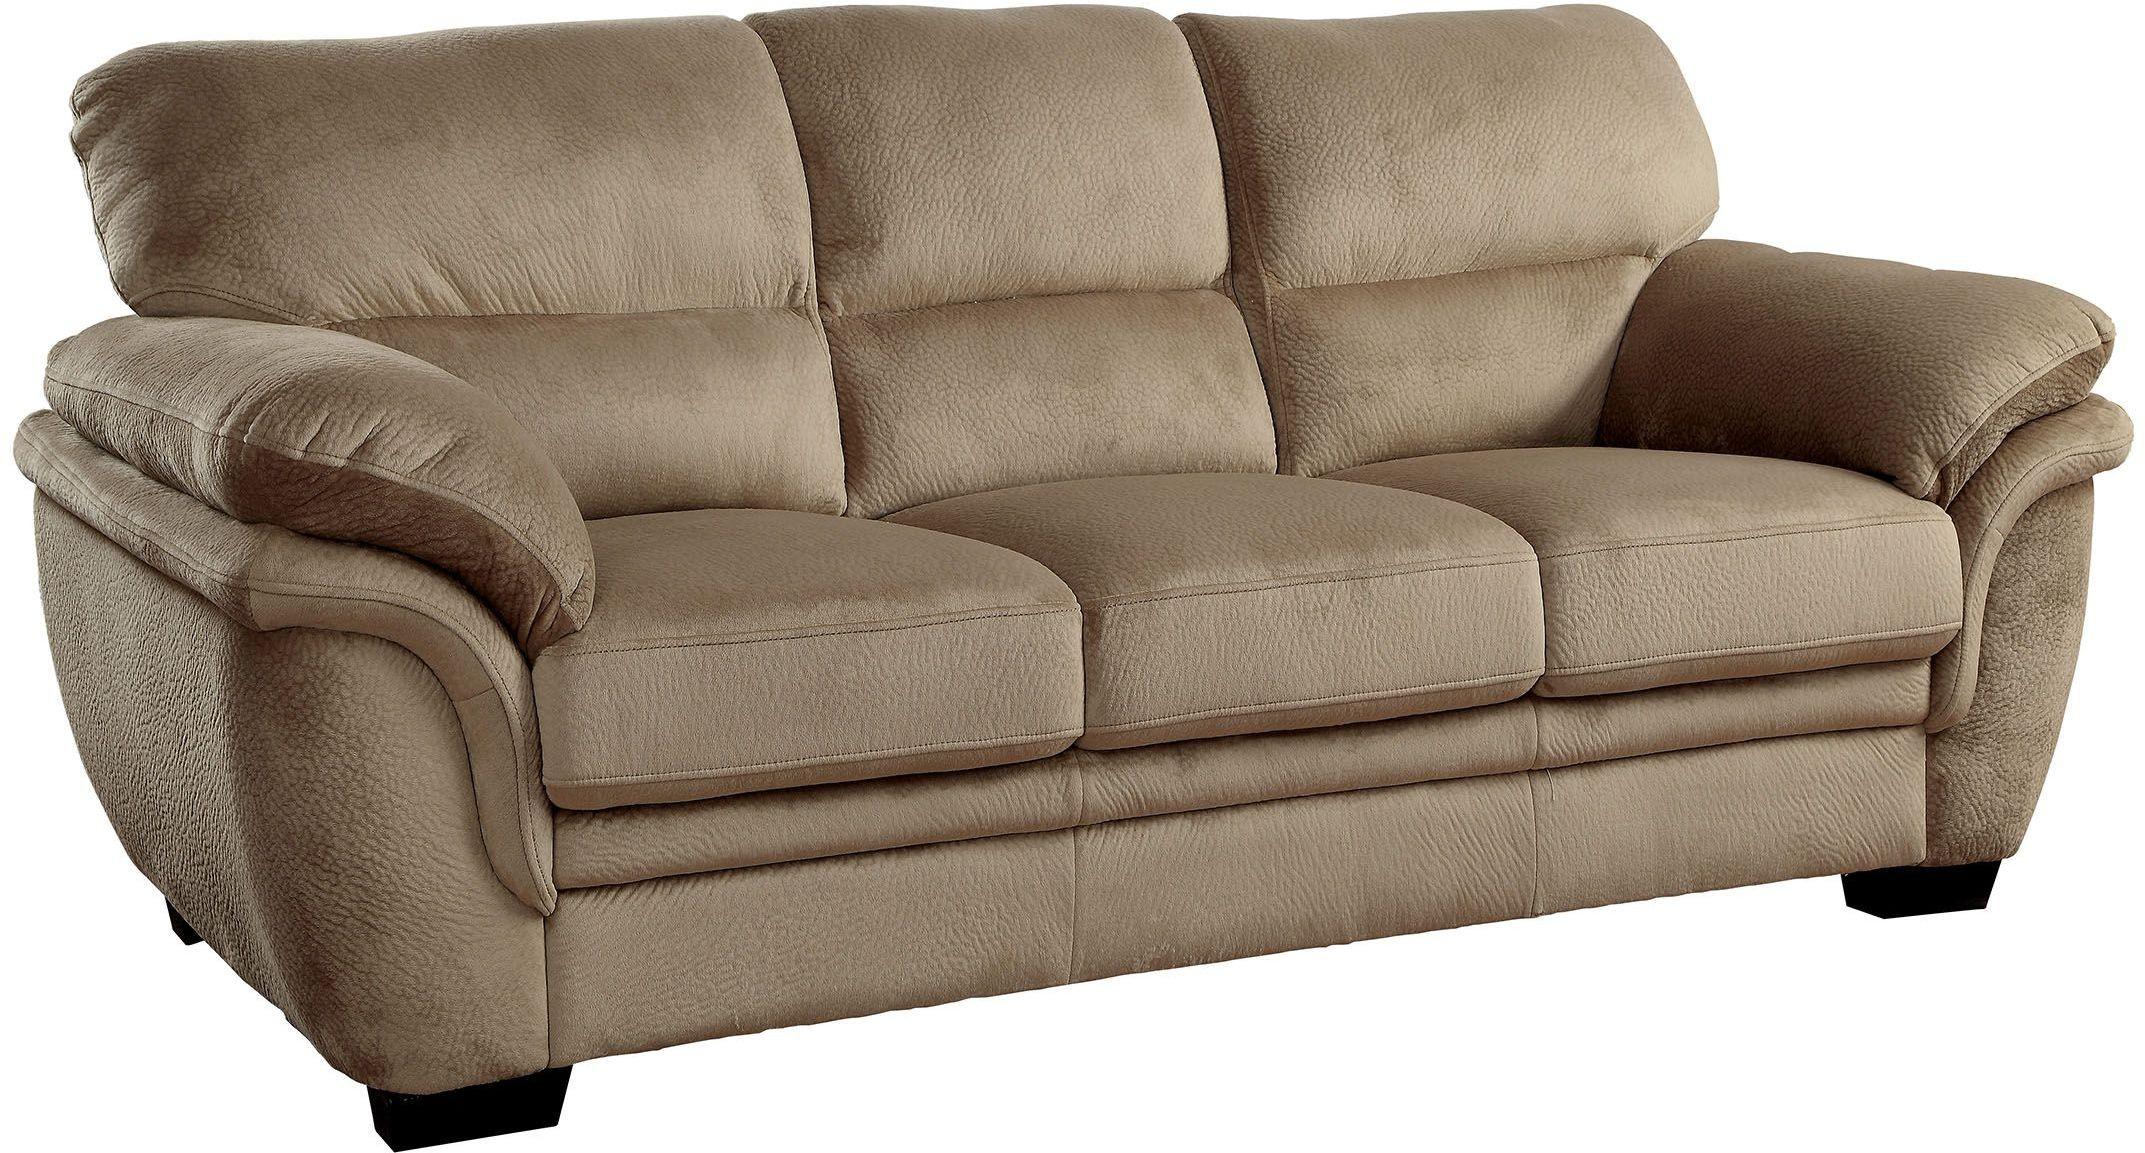 Jaya Light Brown Sofa from Furniture of America